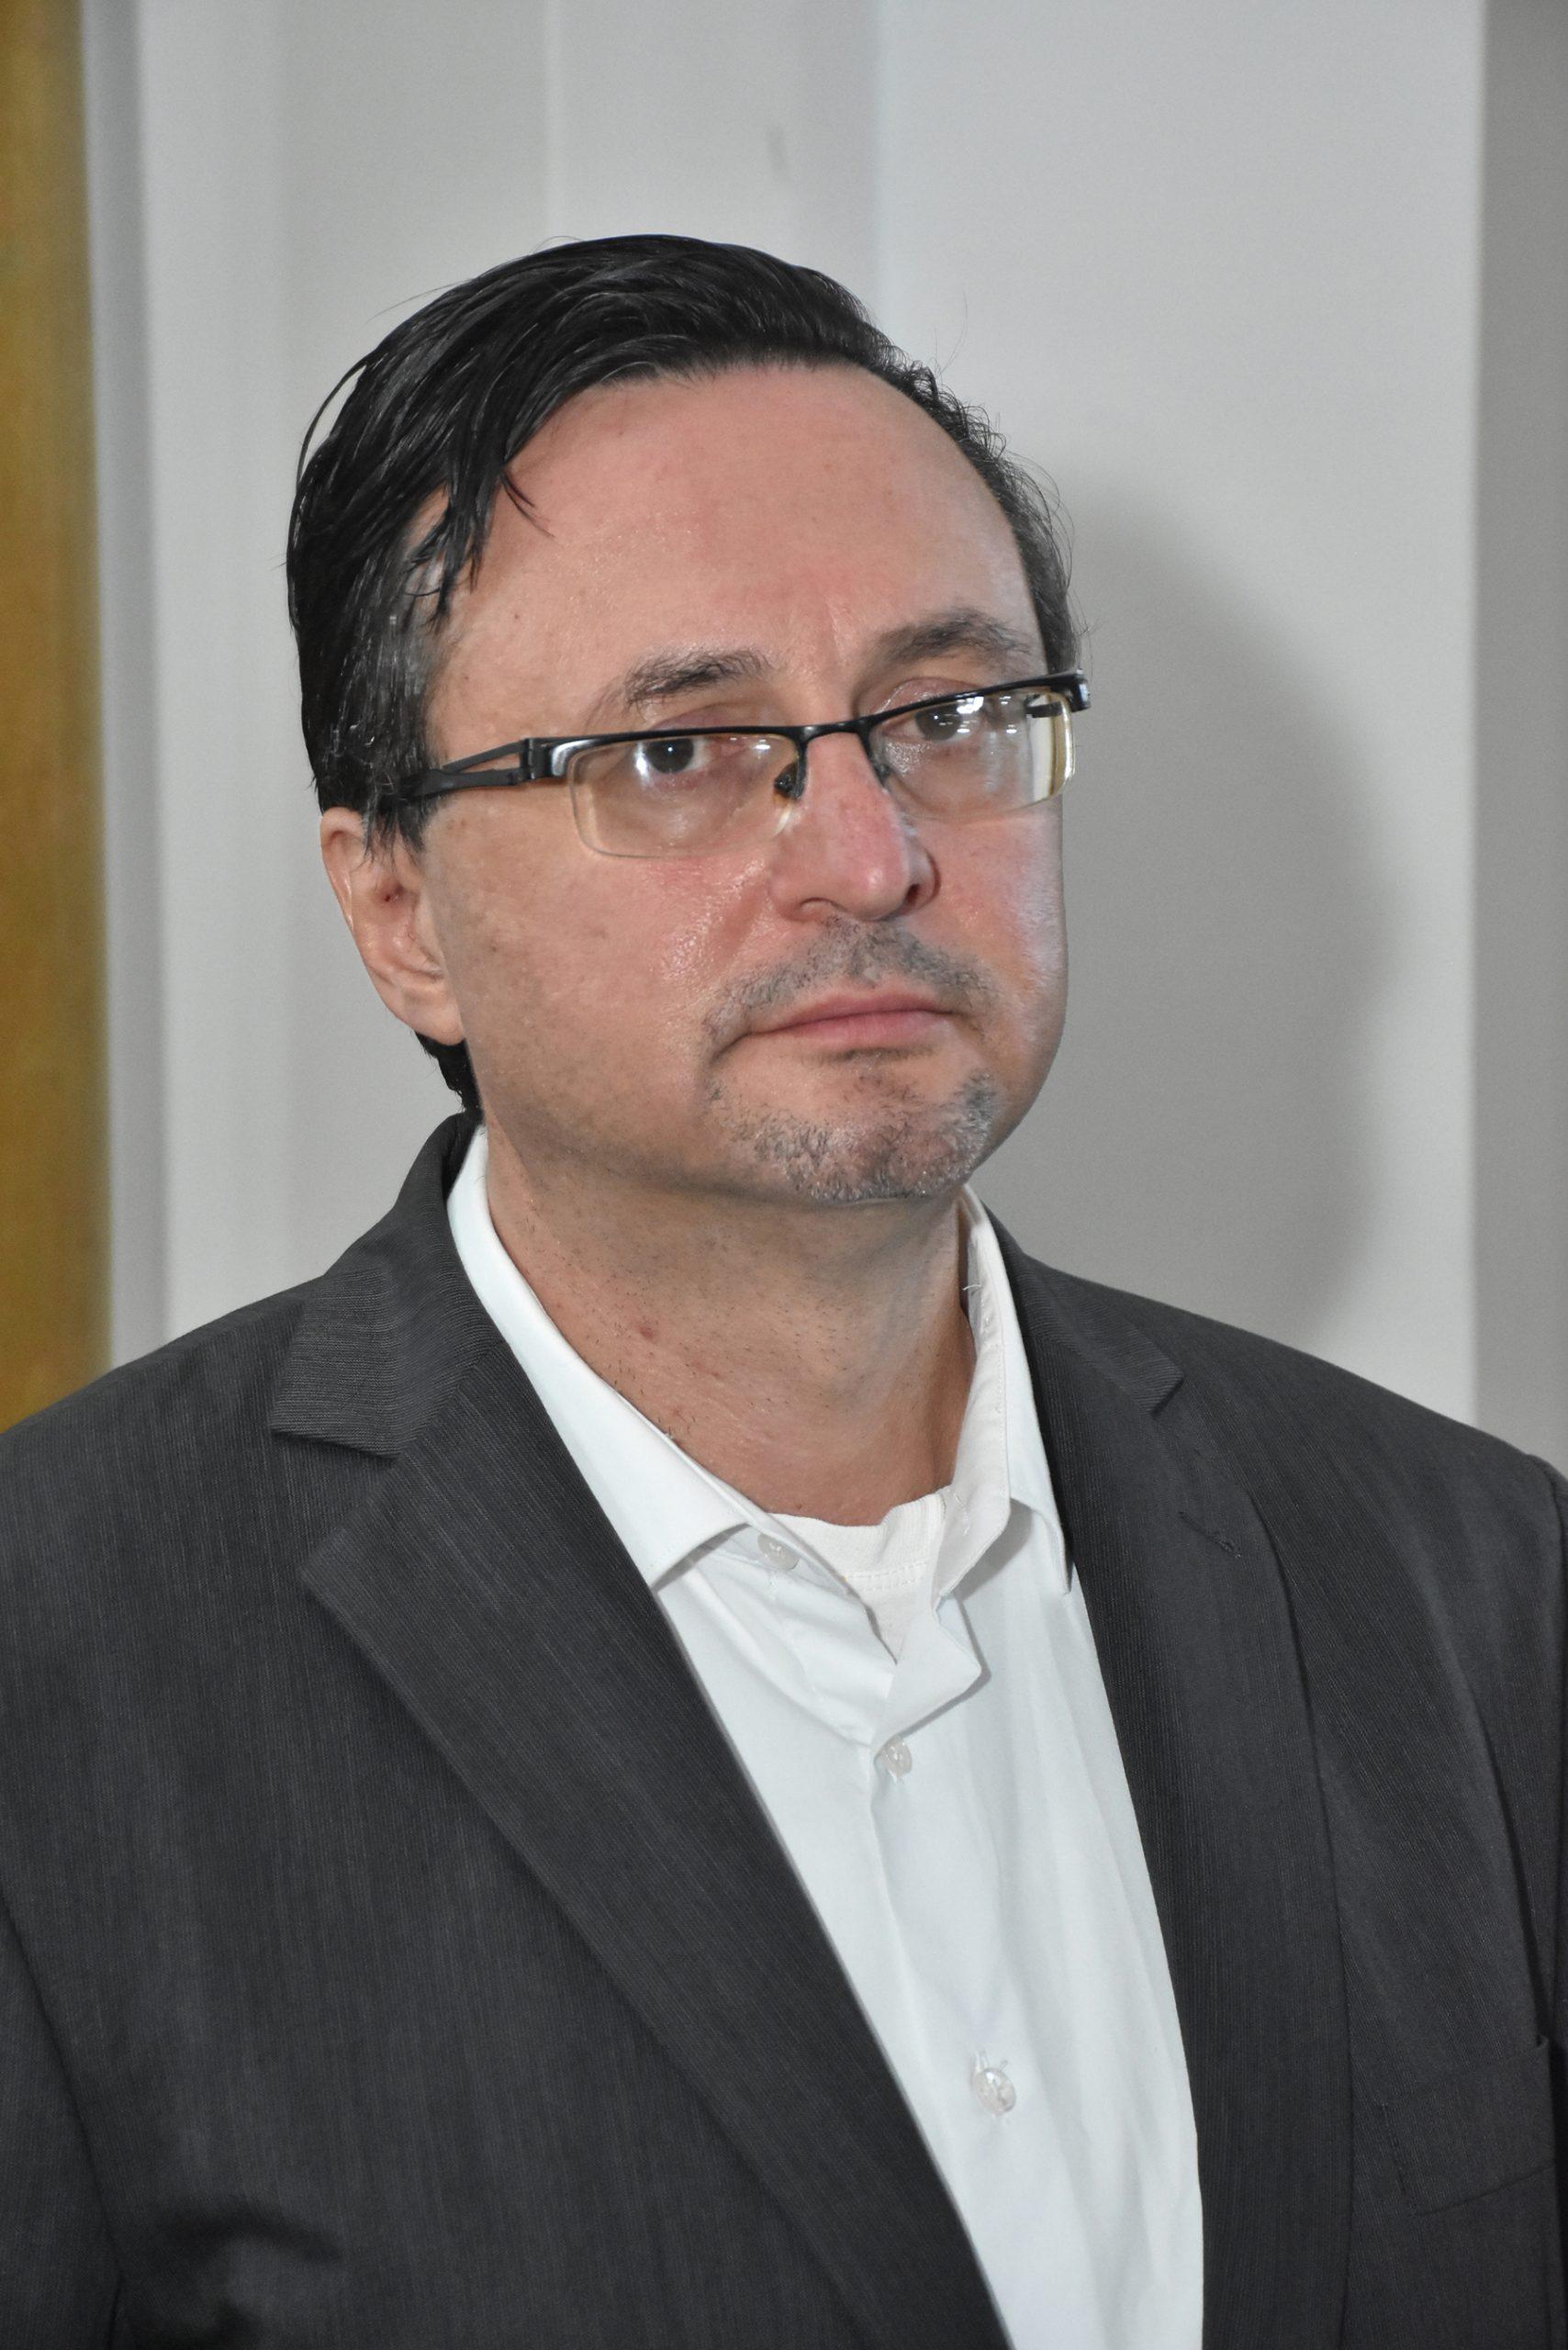 Dejan Dabic